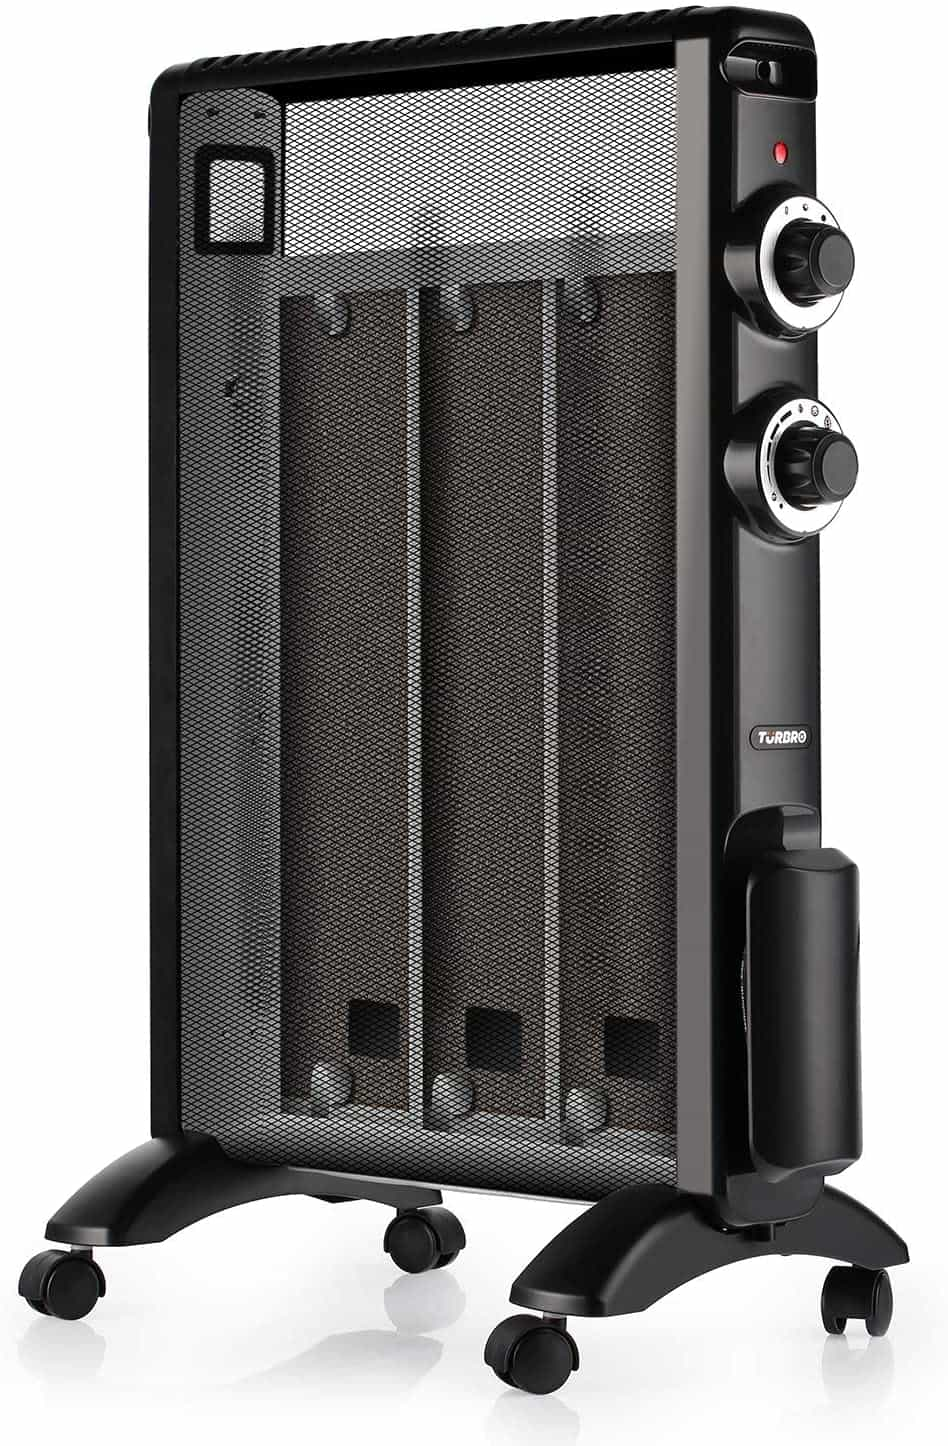 TURBRO Arcade HR1015 Electric Mica Heater